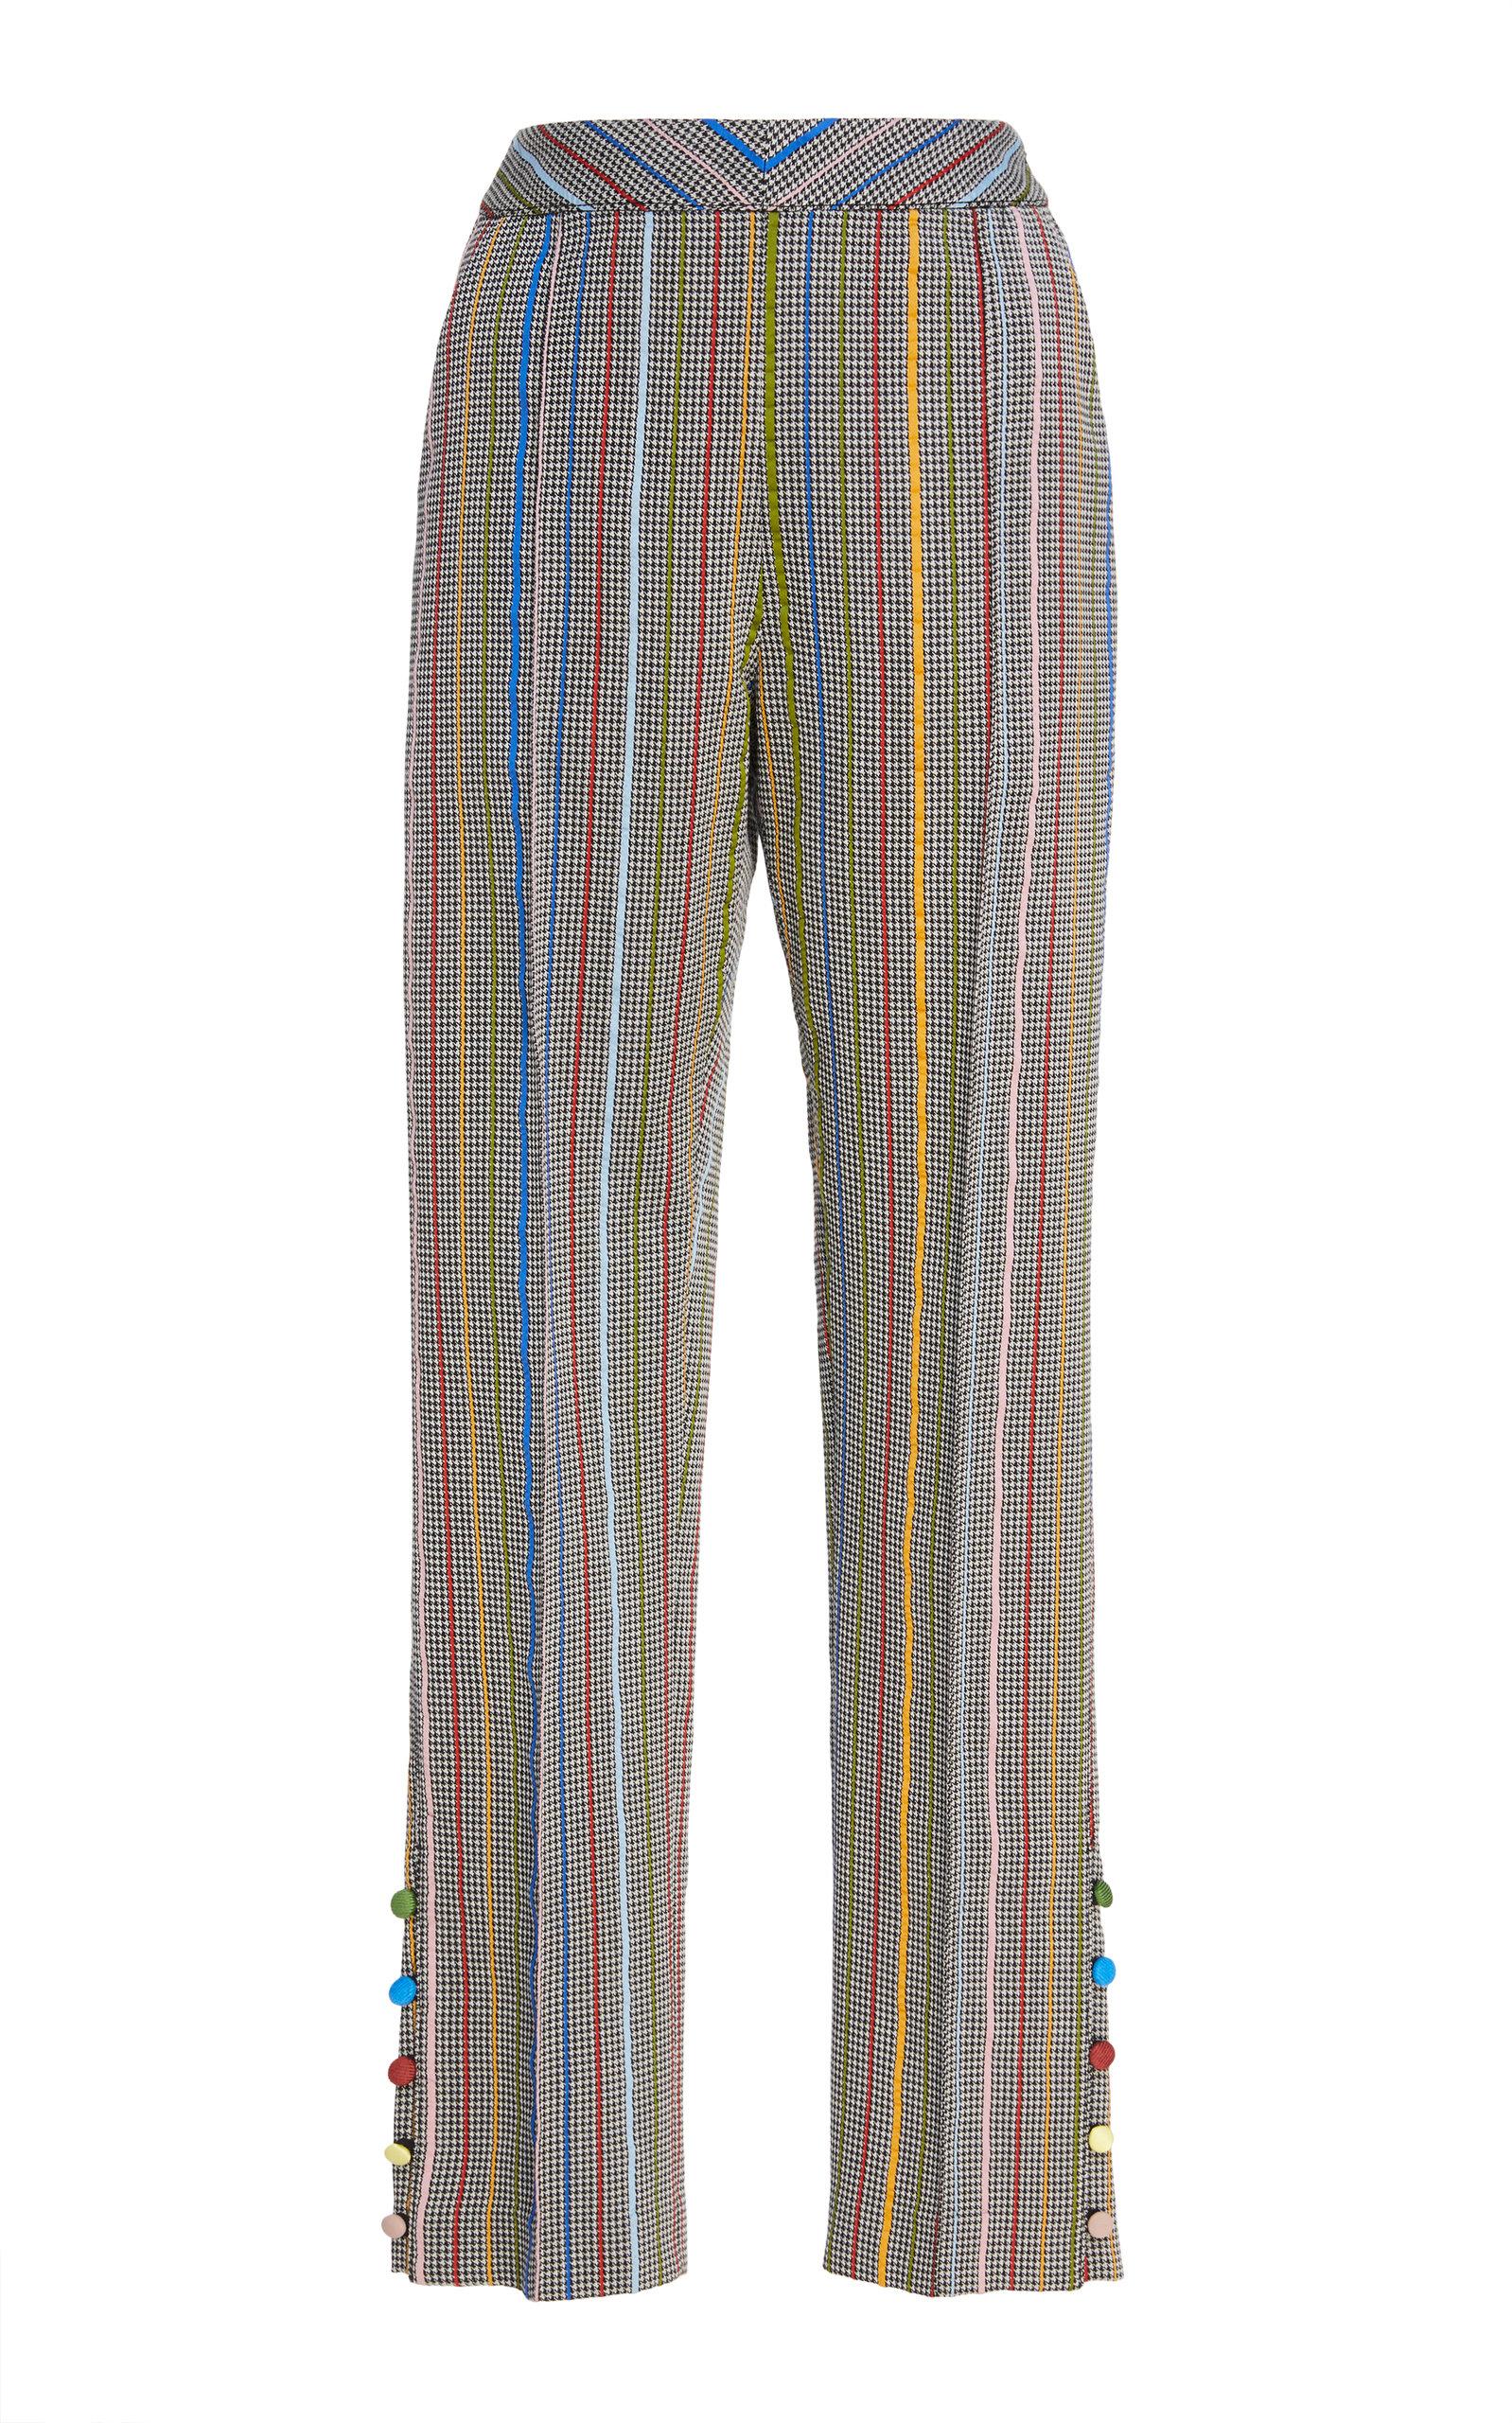 Oboe Wool And Silk-Blend Jacquard Slim-Leg Pants in Multicolour